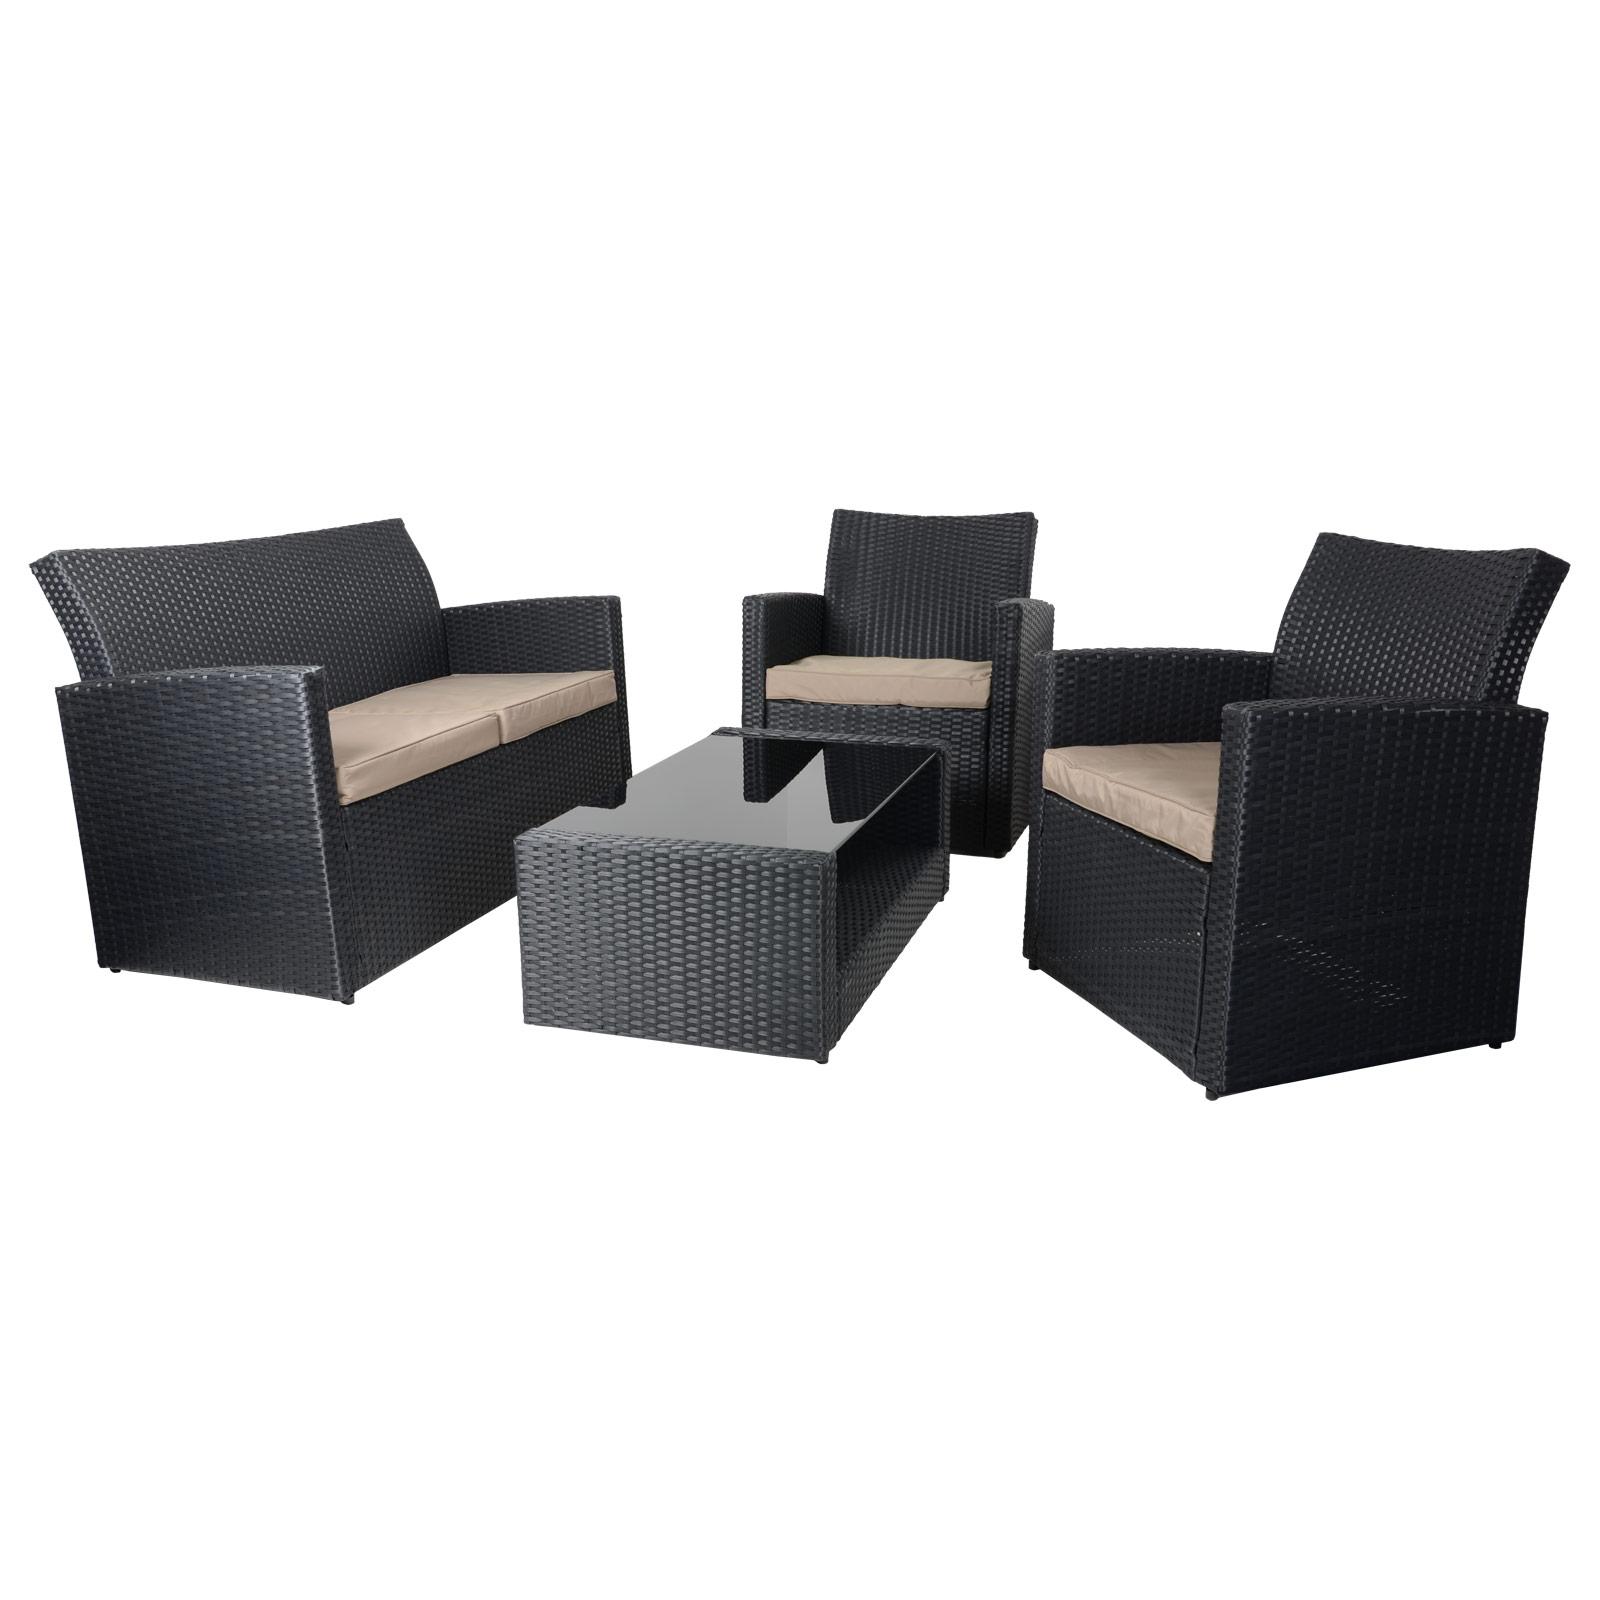 4pc Tuscany Rattan Wicker Sofa Set Garden Conservatory Furniture